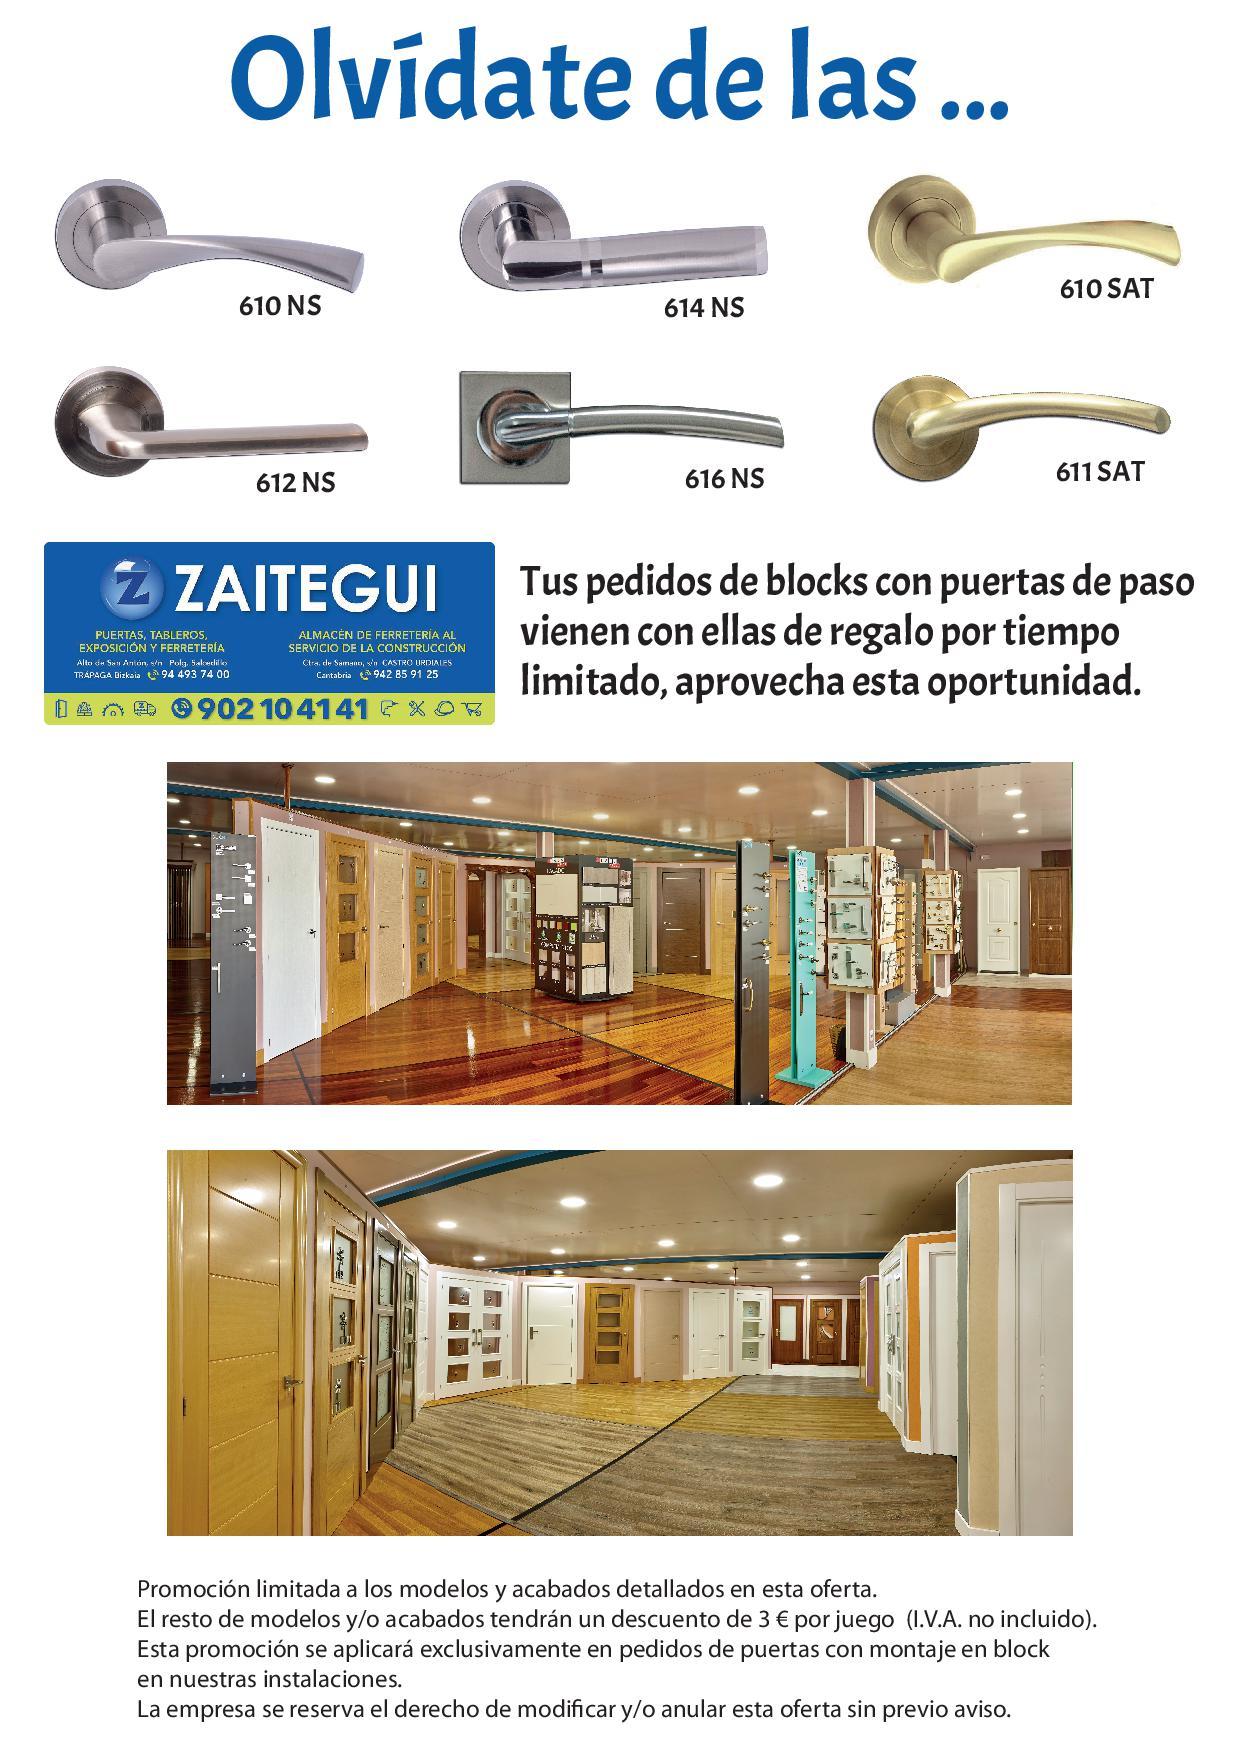 Puertas en block con manillas gratis zaitegui for Puertas zaitegui